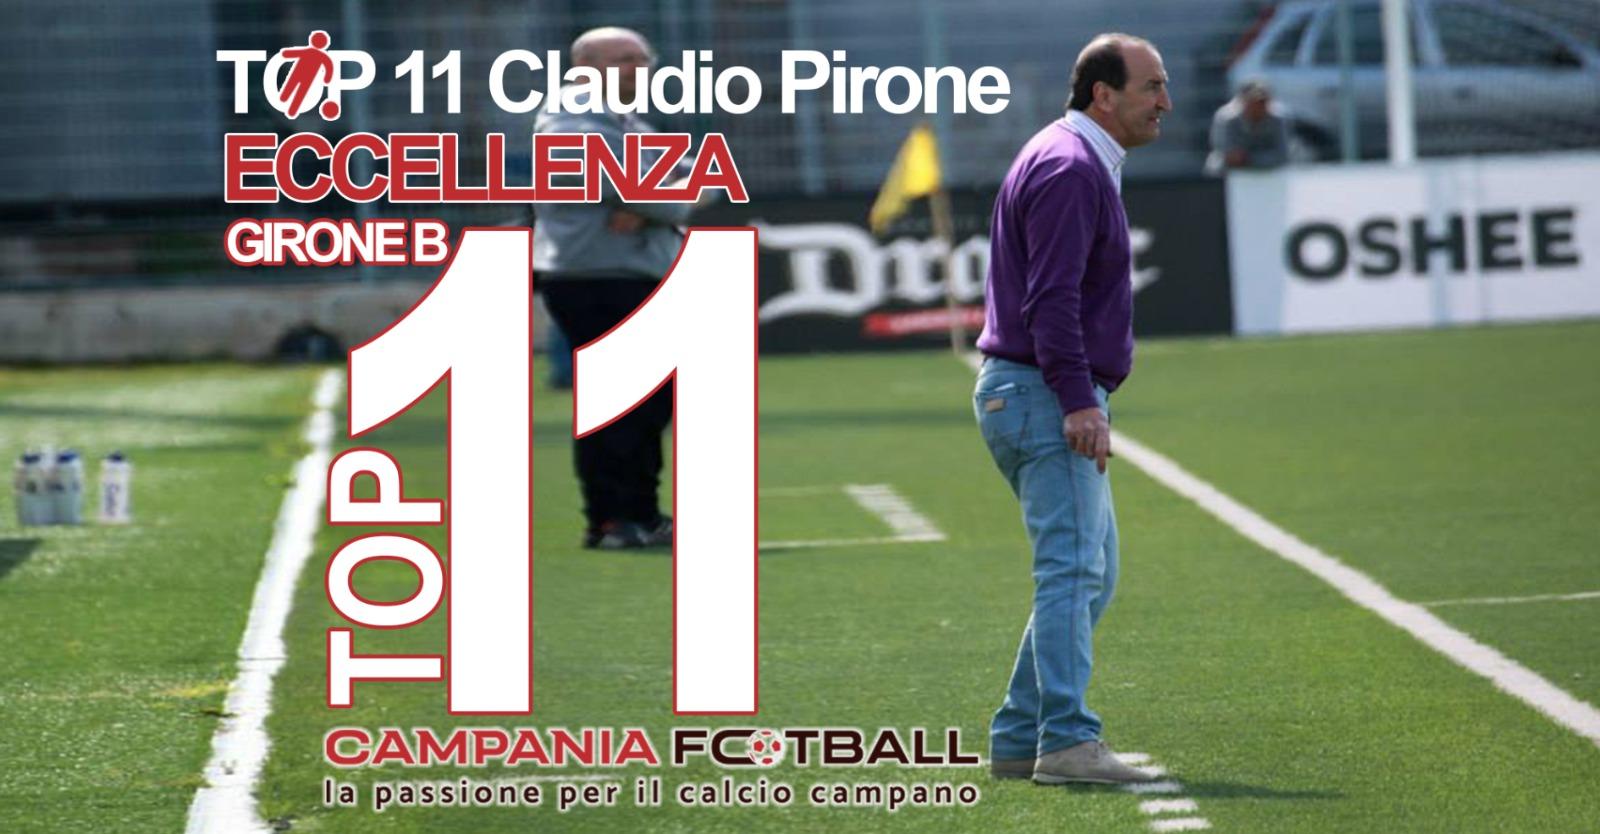 TOP 11 ECCELLENZA GIRONE B | I migliori undici per Claudio Pirone